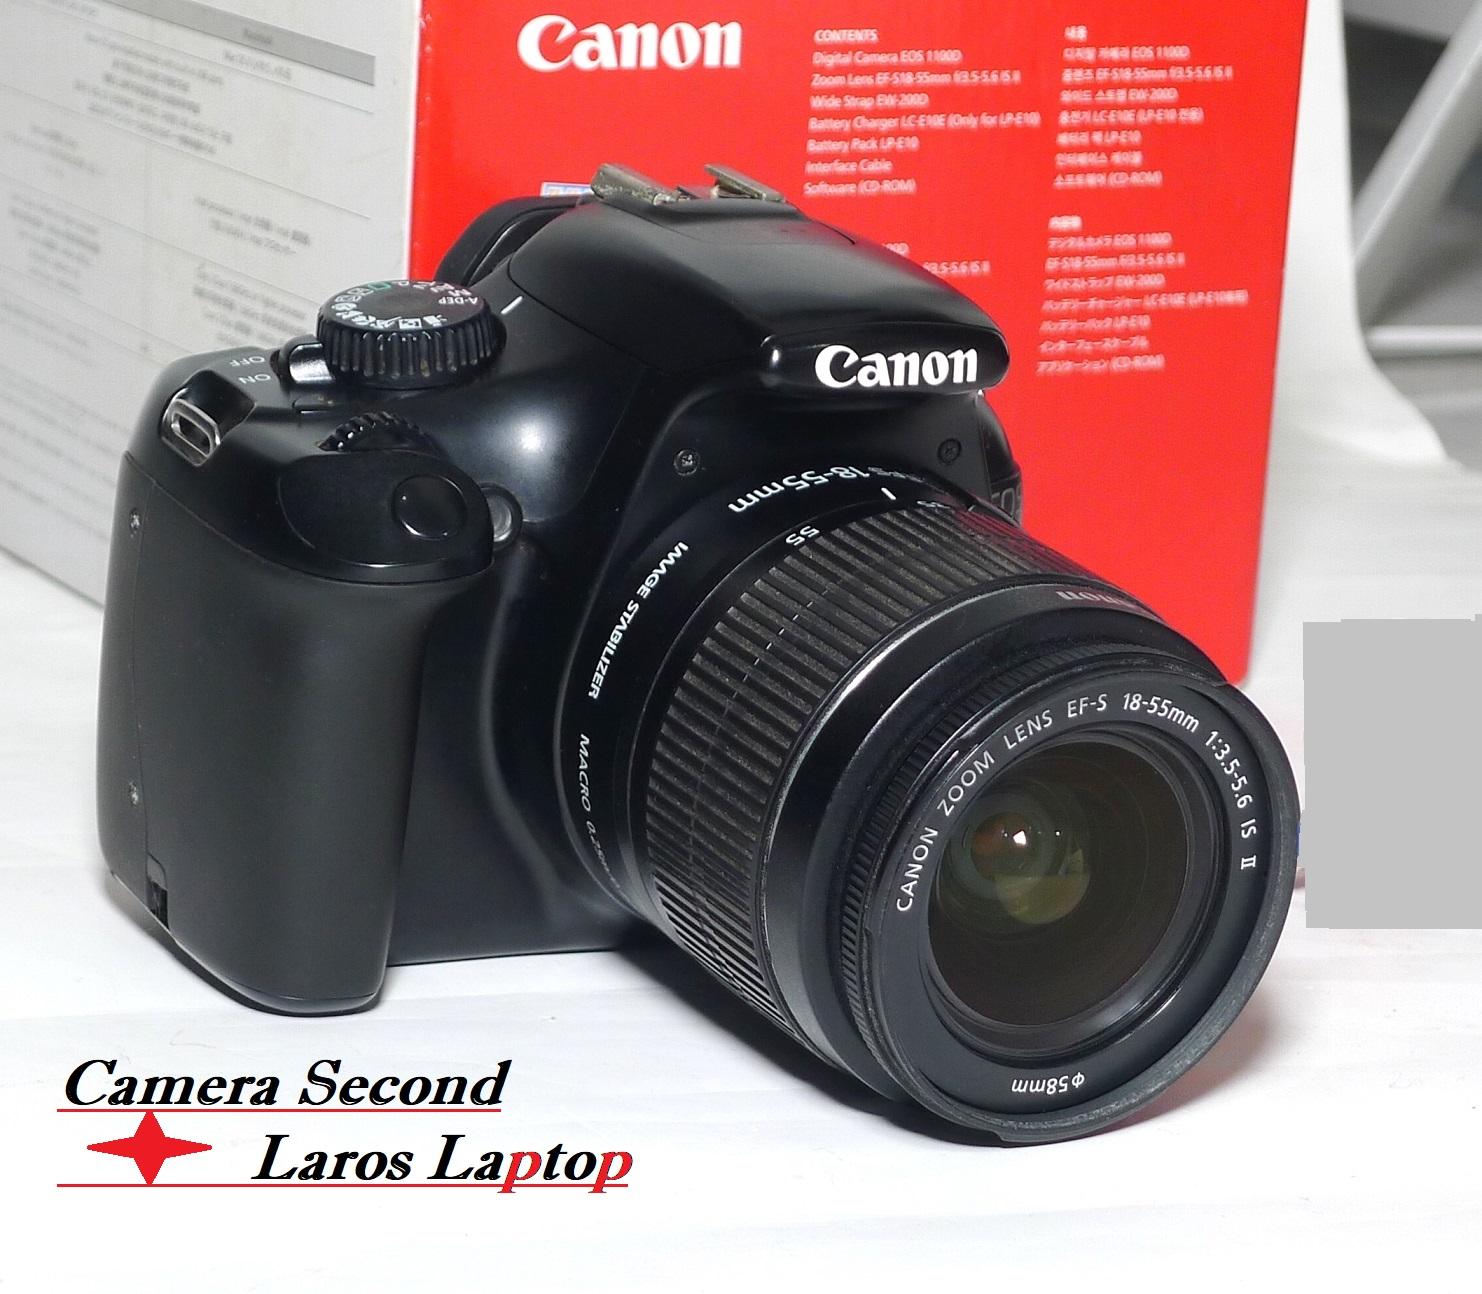 Jual Kamera Canon Eos 1100d Fullset Second Jual Beli Laptop